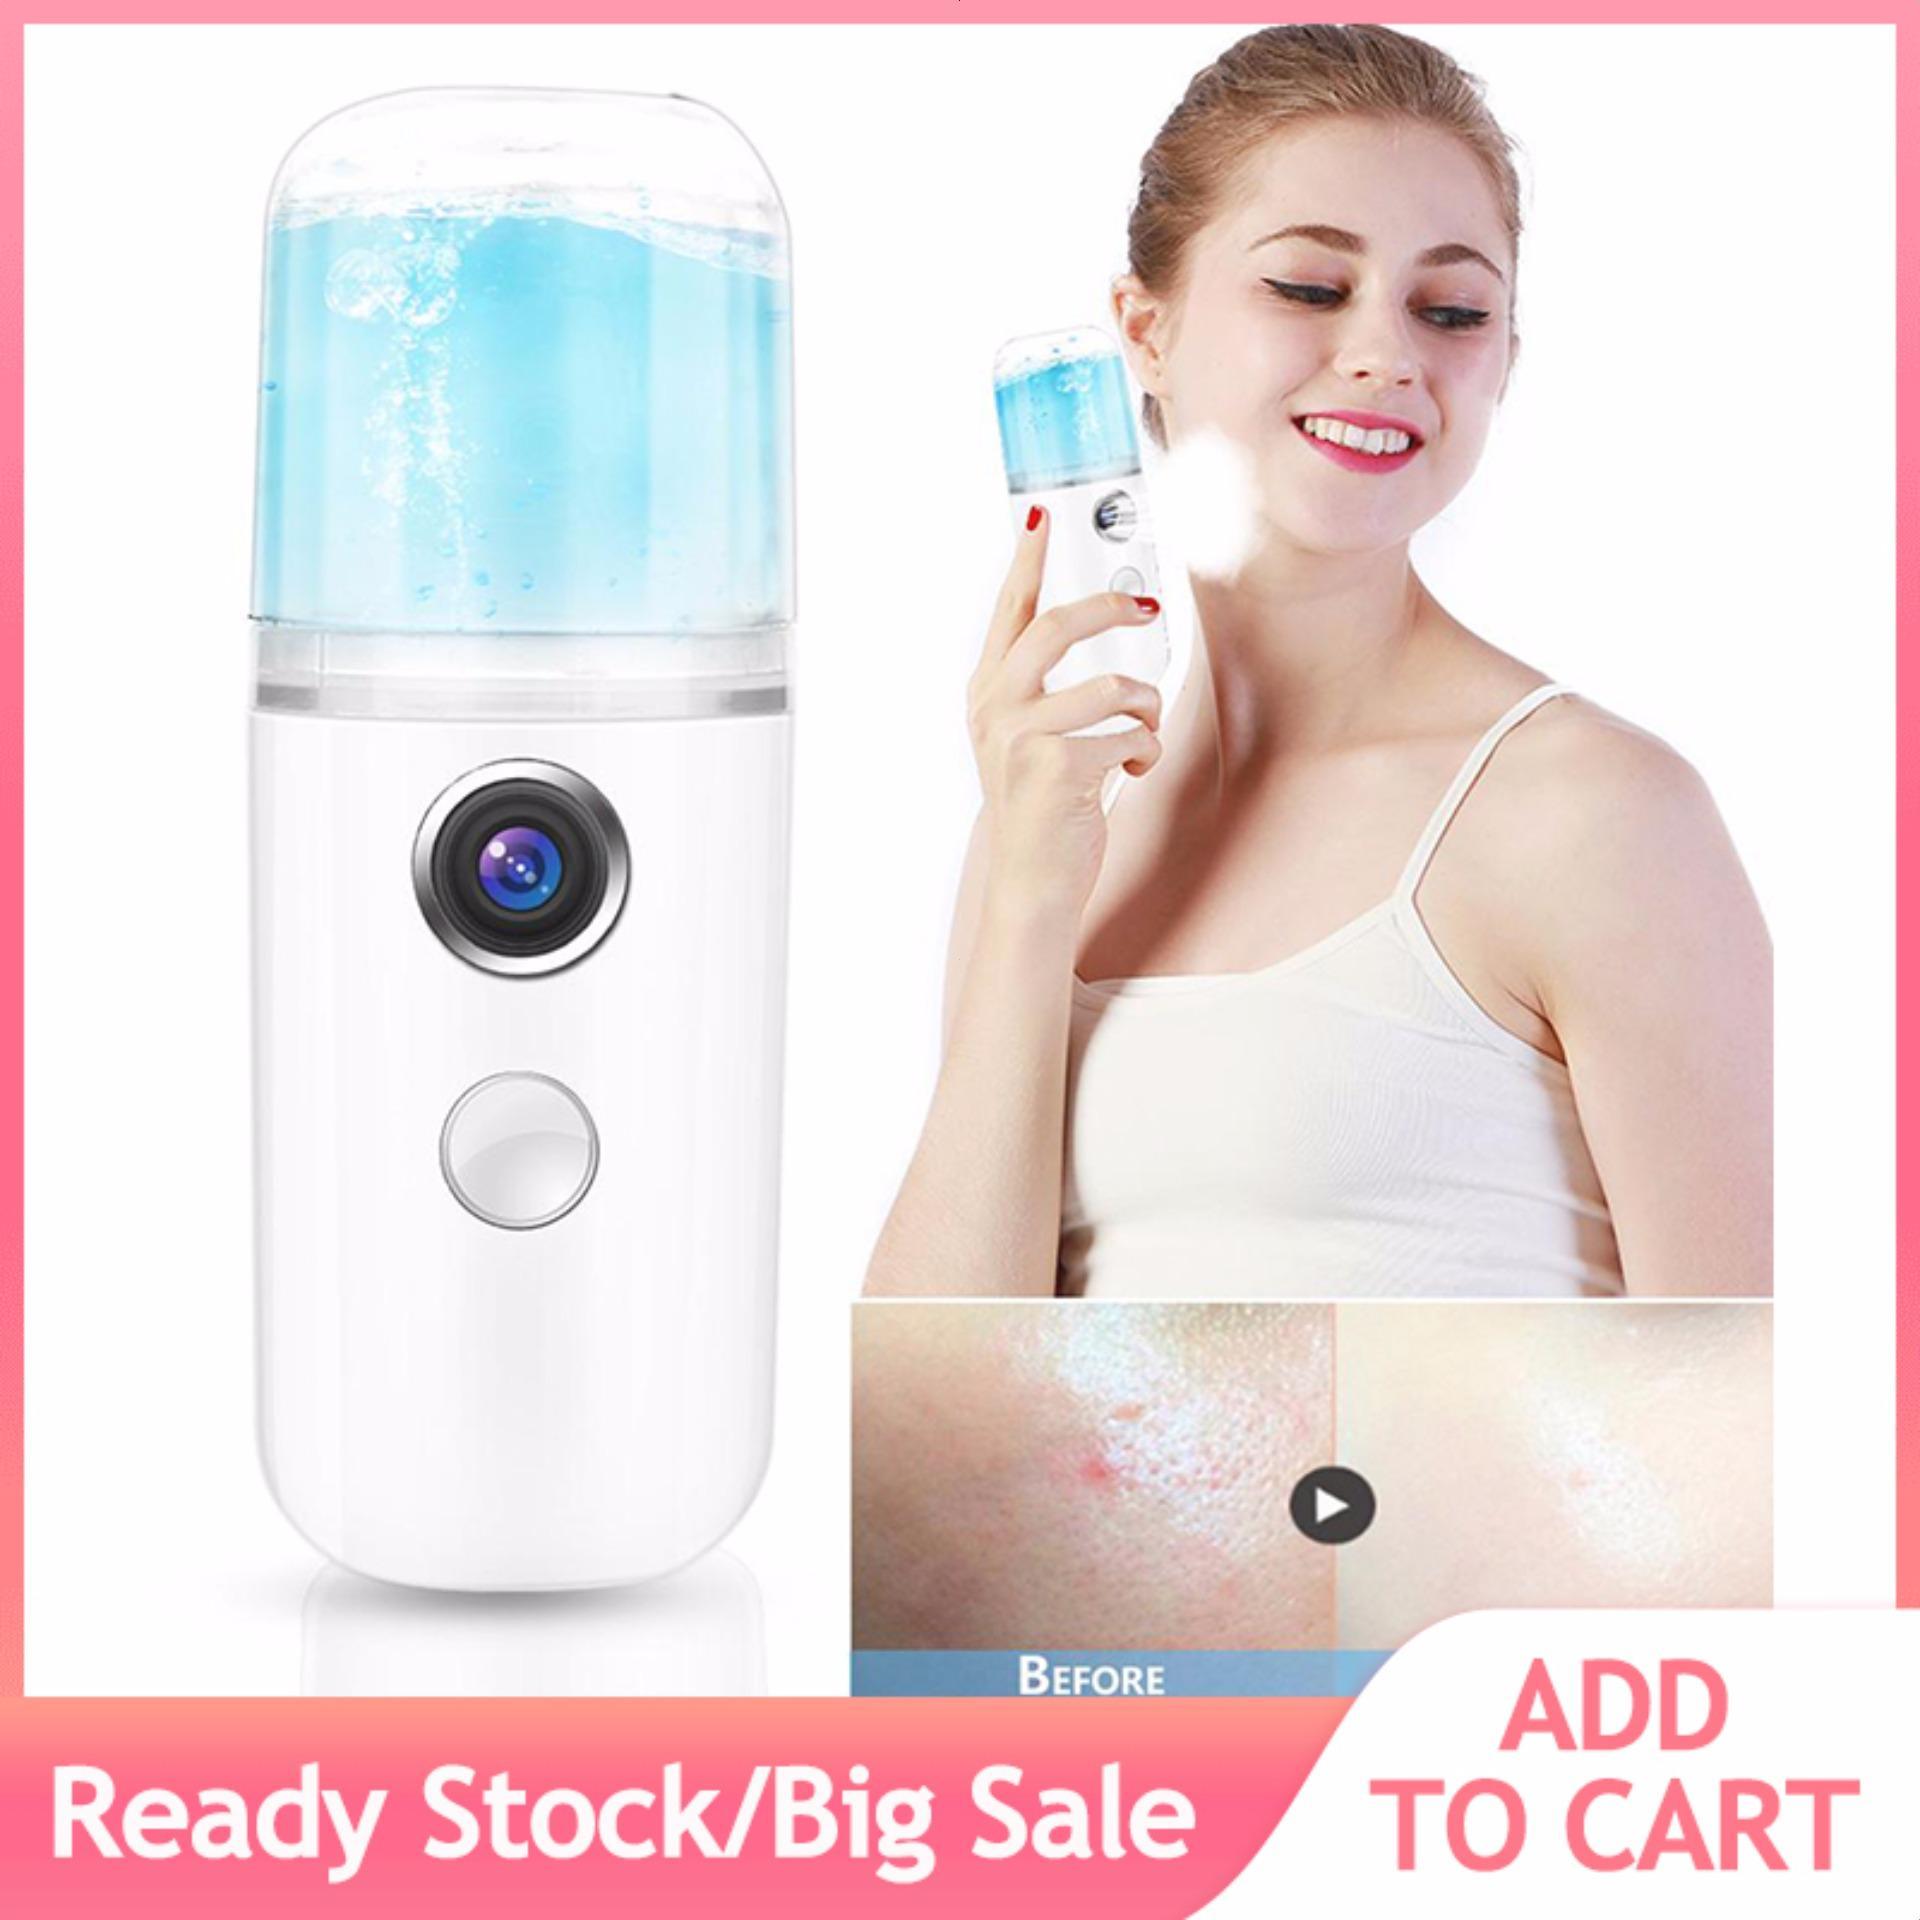 30ml Usb Handy Nano Mist Spray Atomization Mister Face Facial Moisturizing Mist Sprayer By Beautytop.